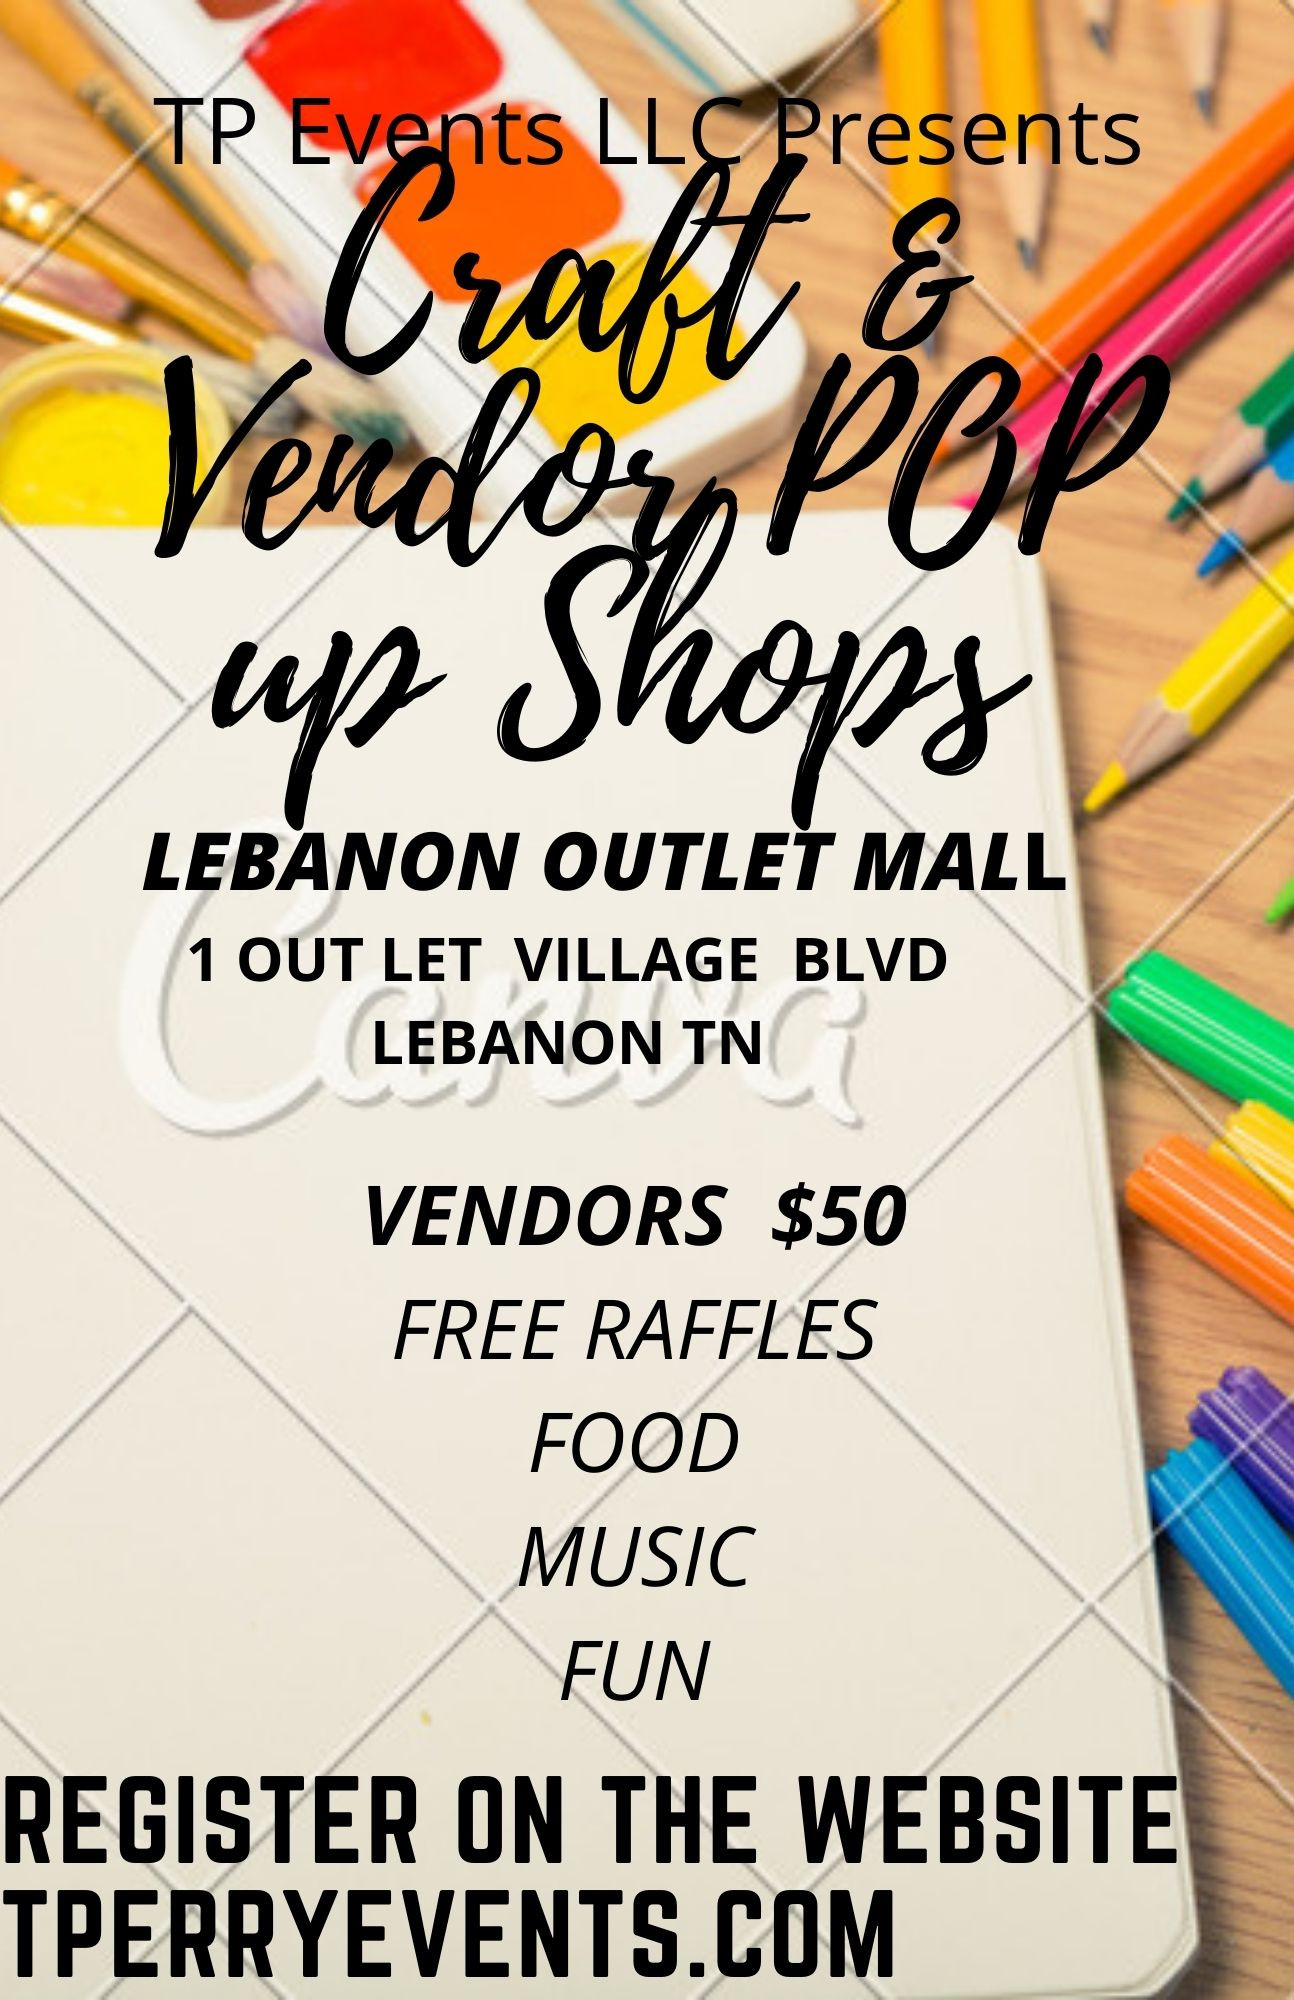 Craft & Vendor pop up shop